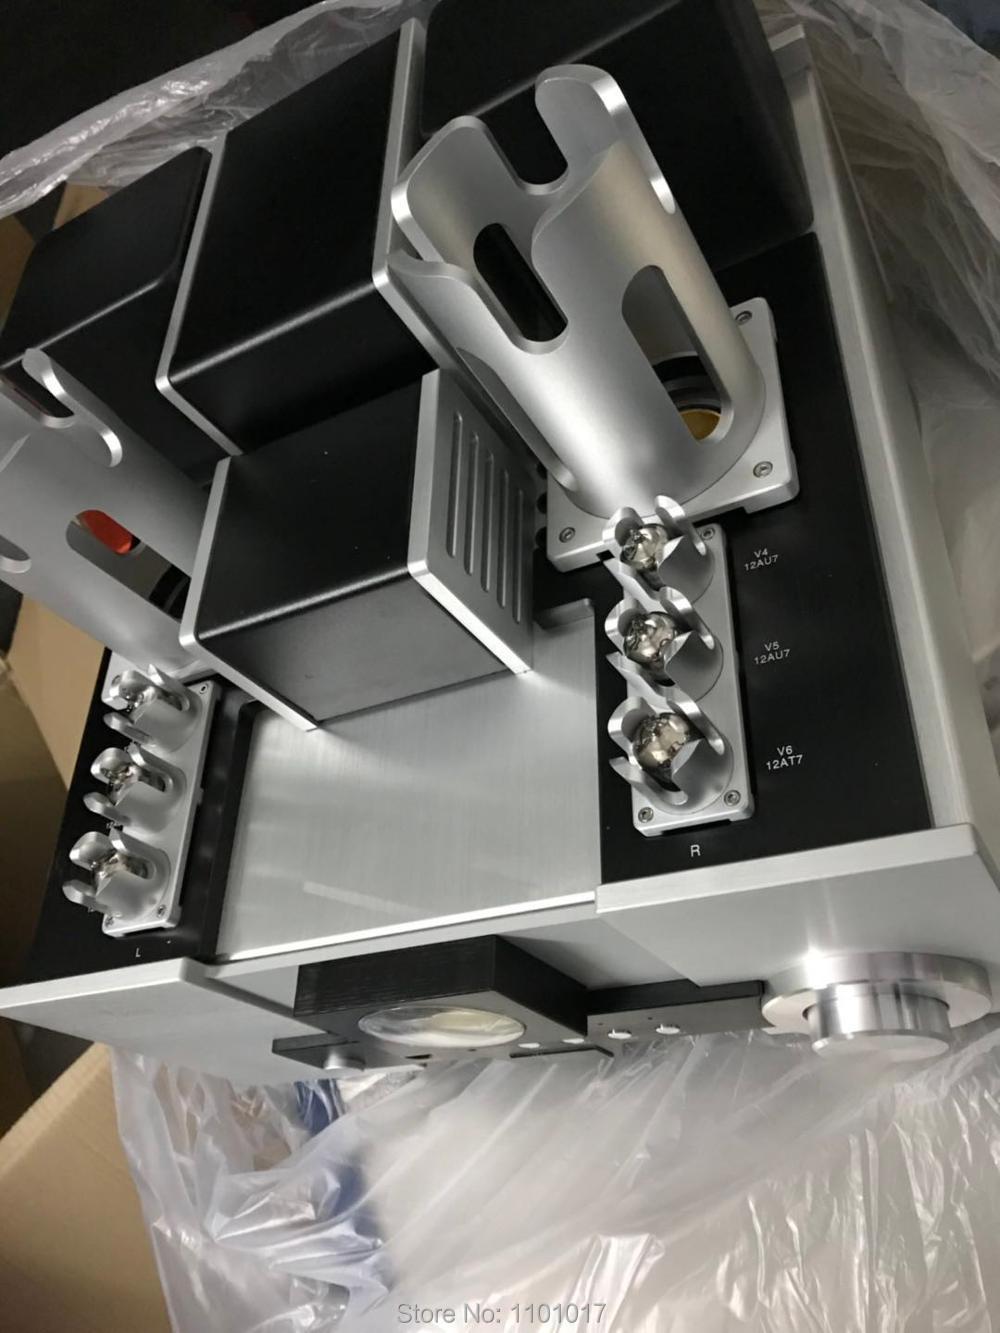 Yaqin_MS-650B_845_tube_amplifier_silver-4